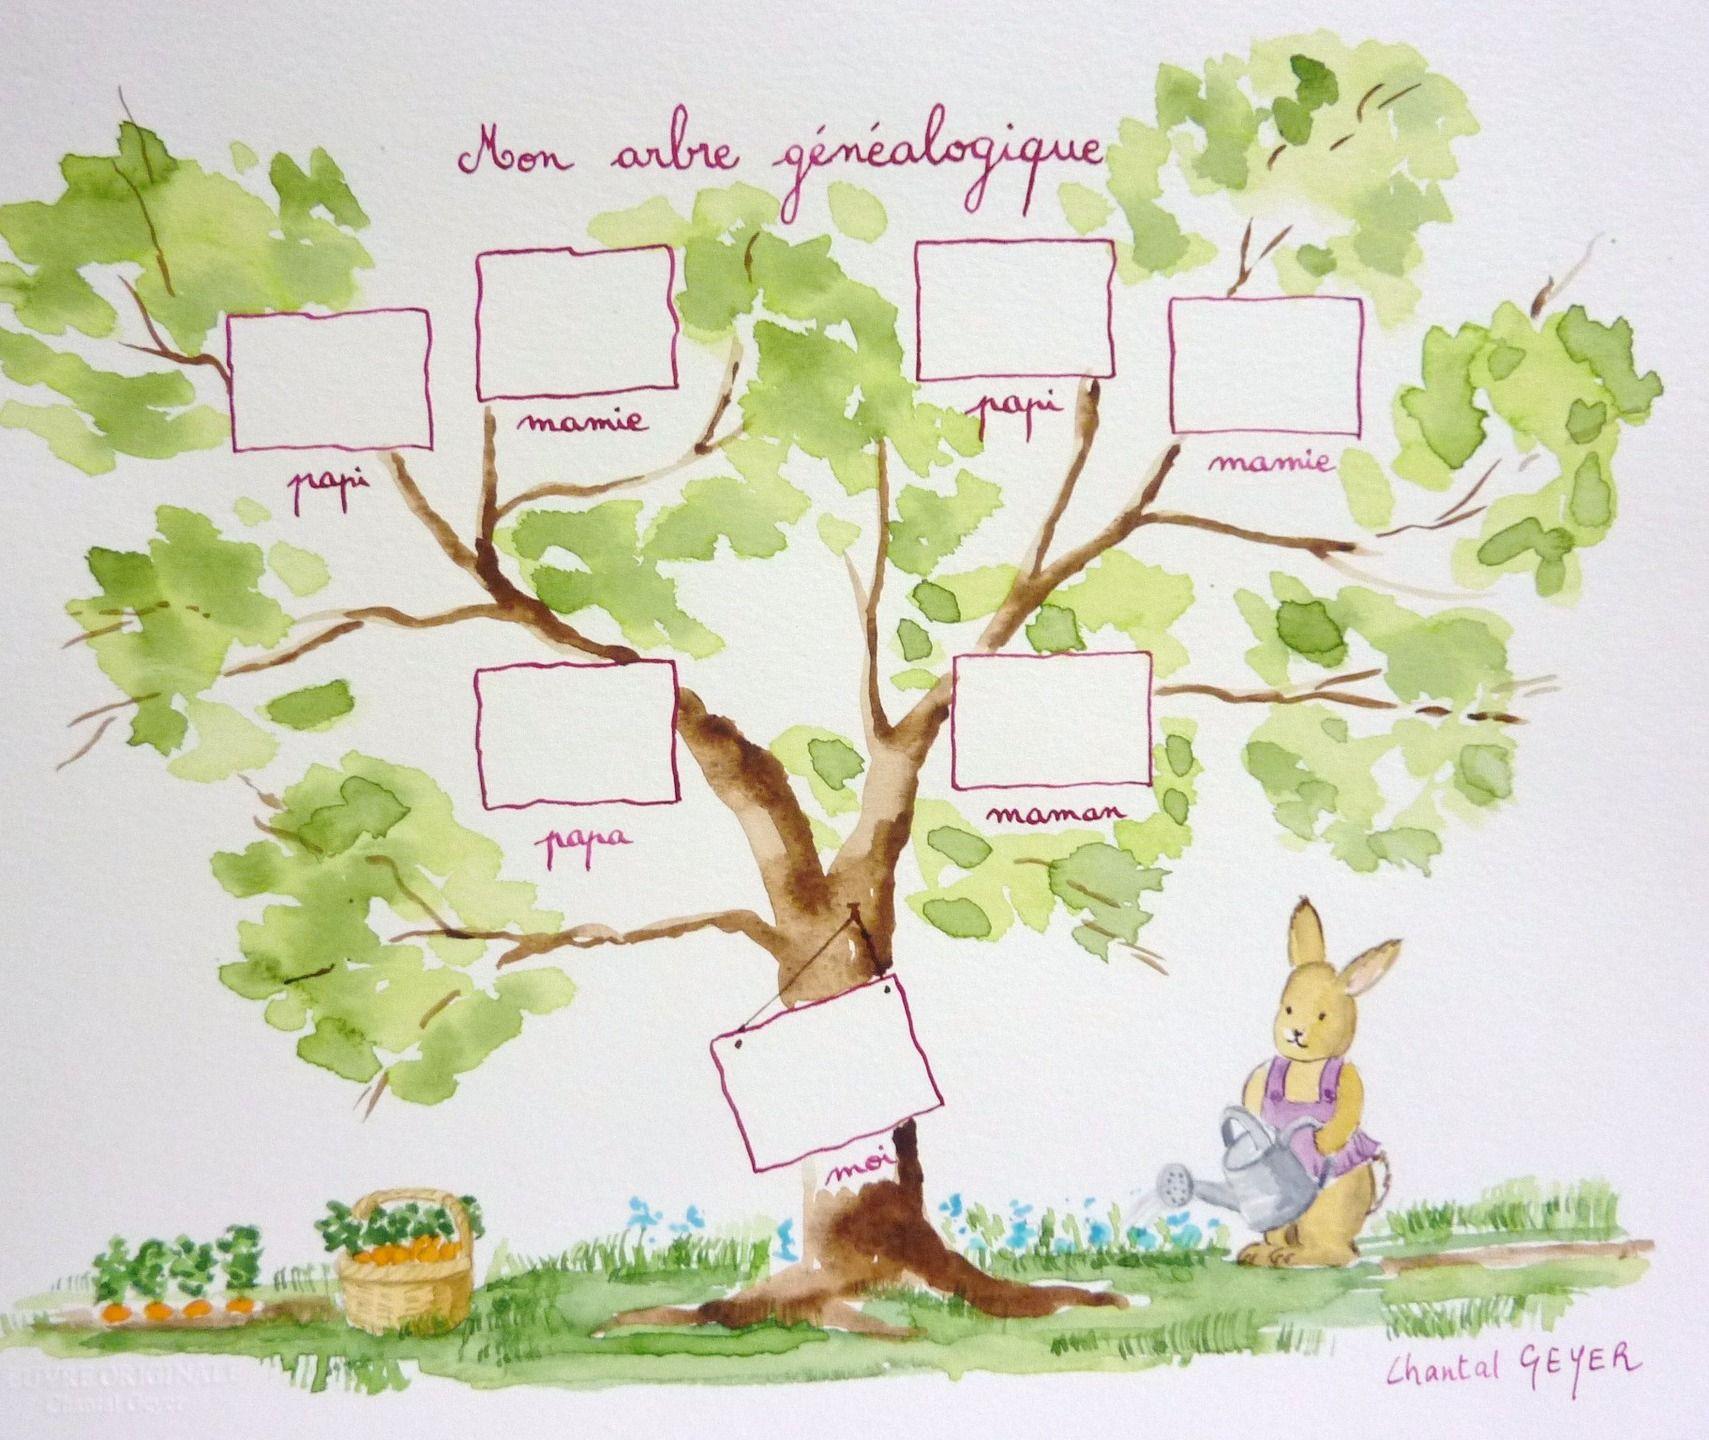 Arbre Genealogique A Remplir 3 Generations Ascendantes Chambre D